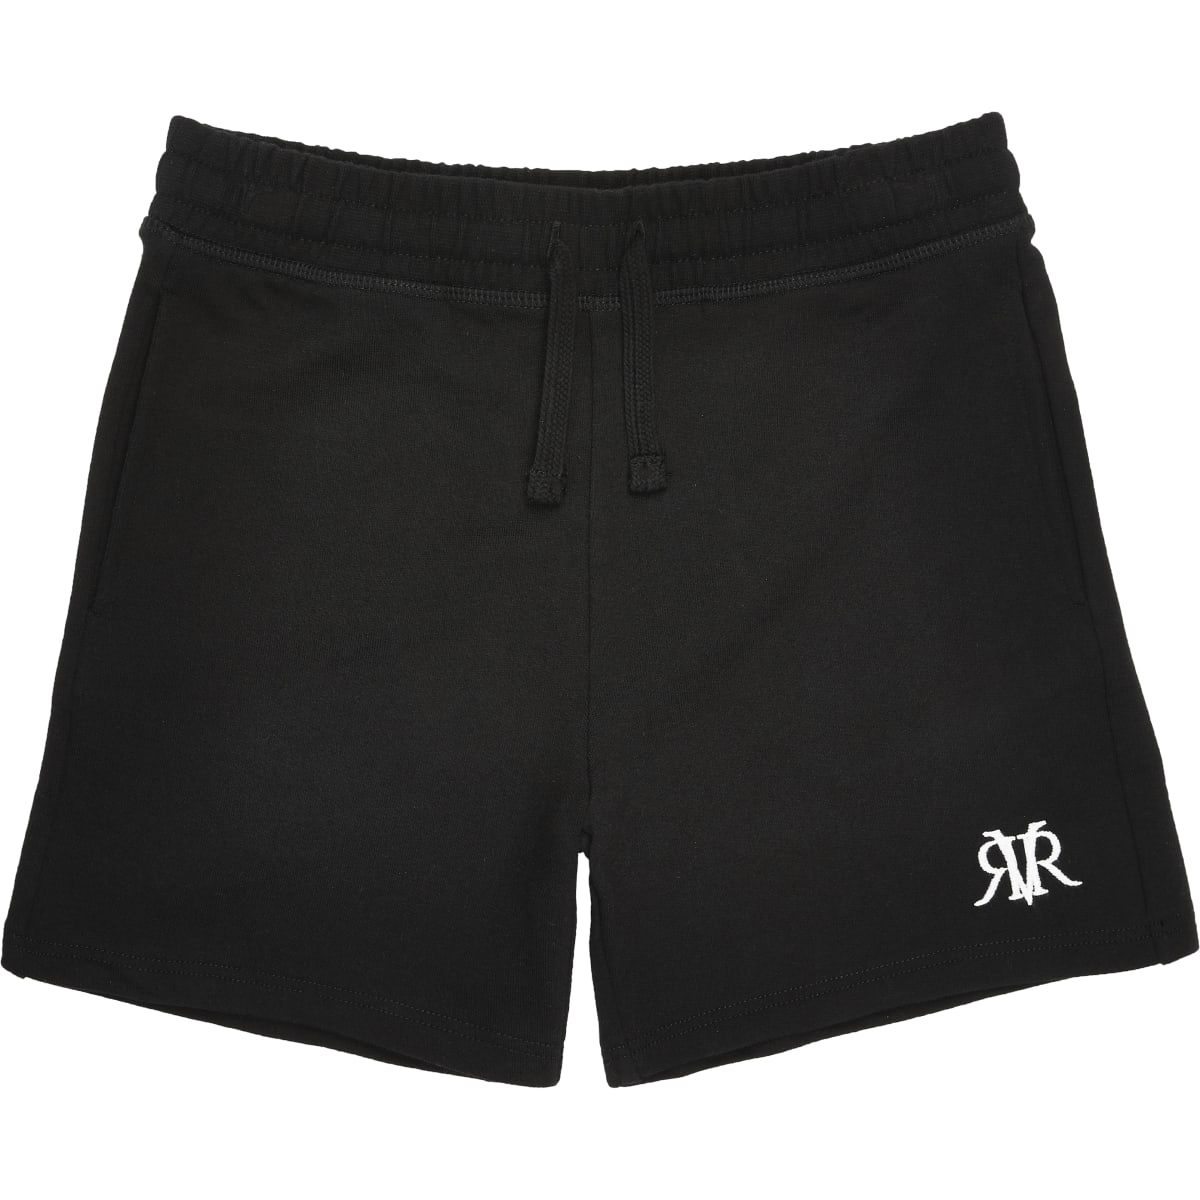 Boys black RVR shorts